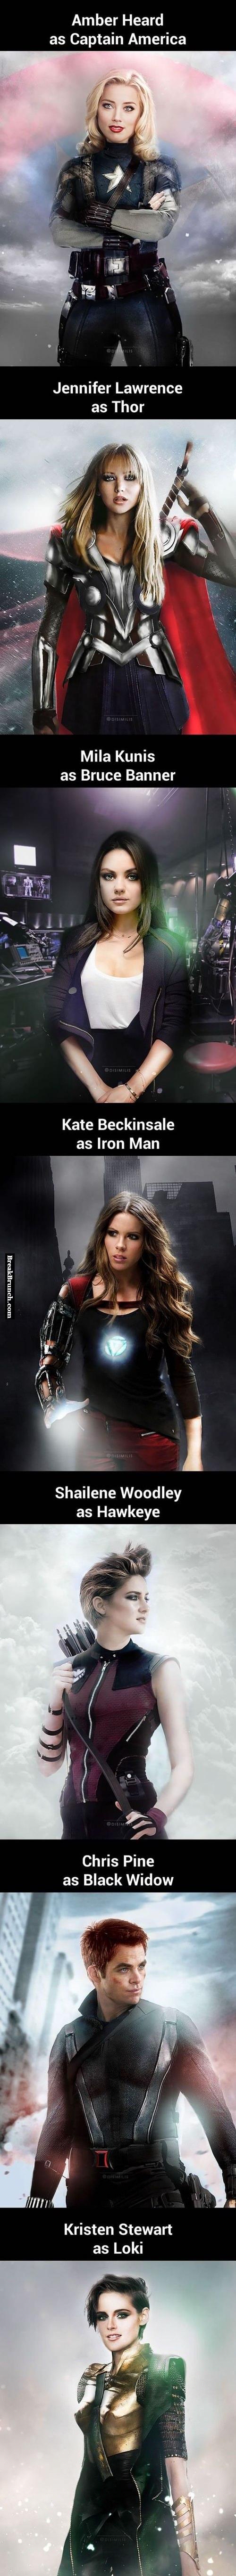 Celebrities as superheros